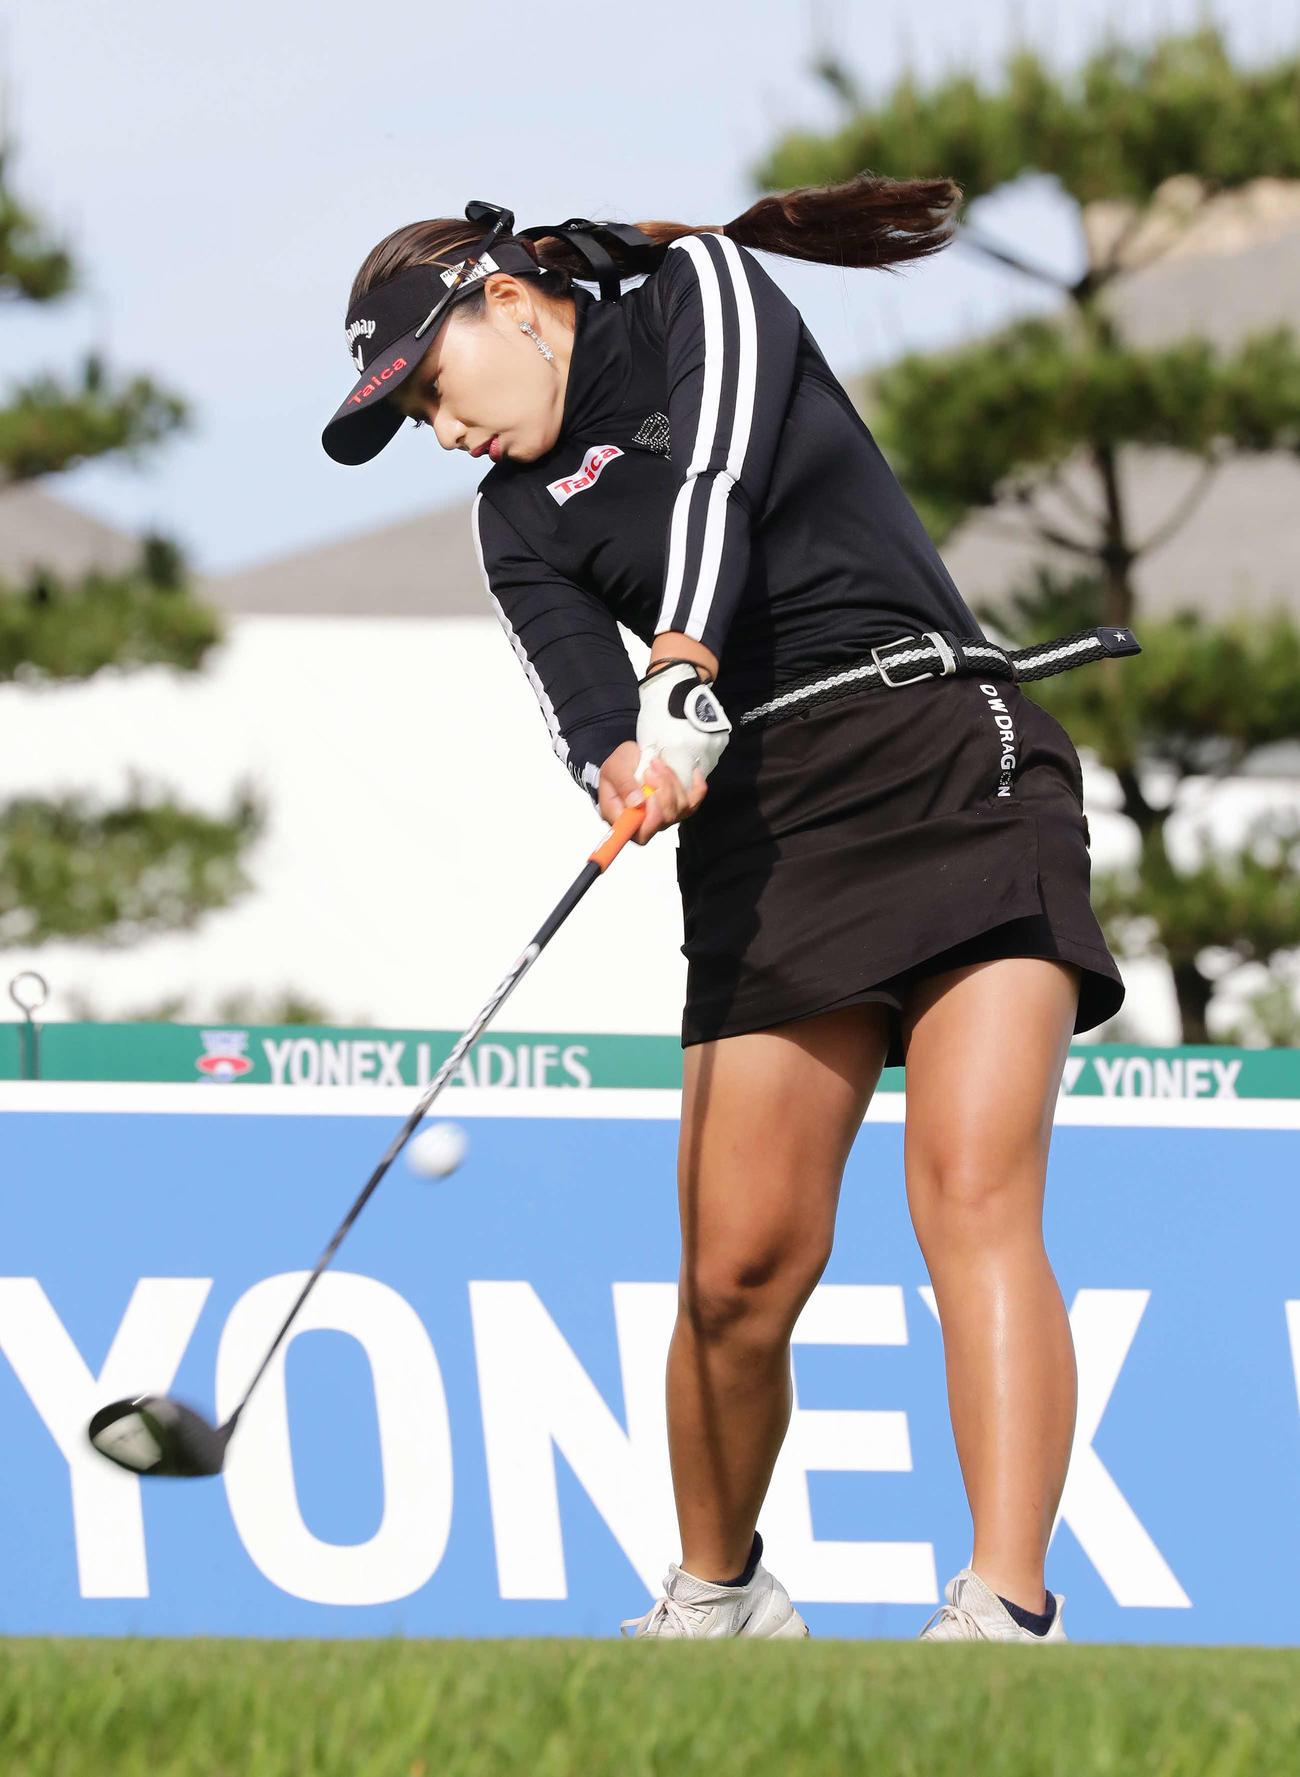 https://www.nikkansports.com/sports/golf/news/img/202106050000094-w1300_3.jpg